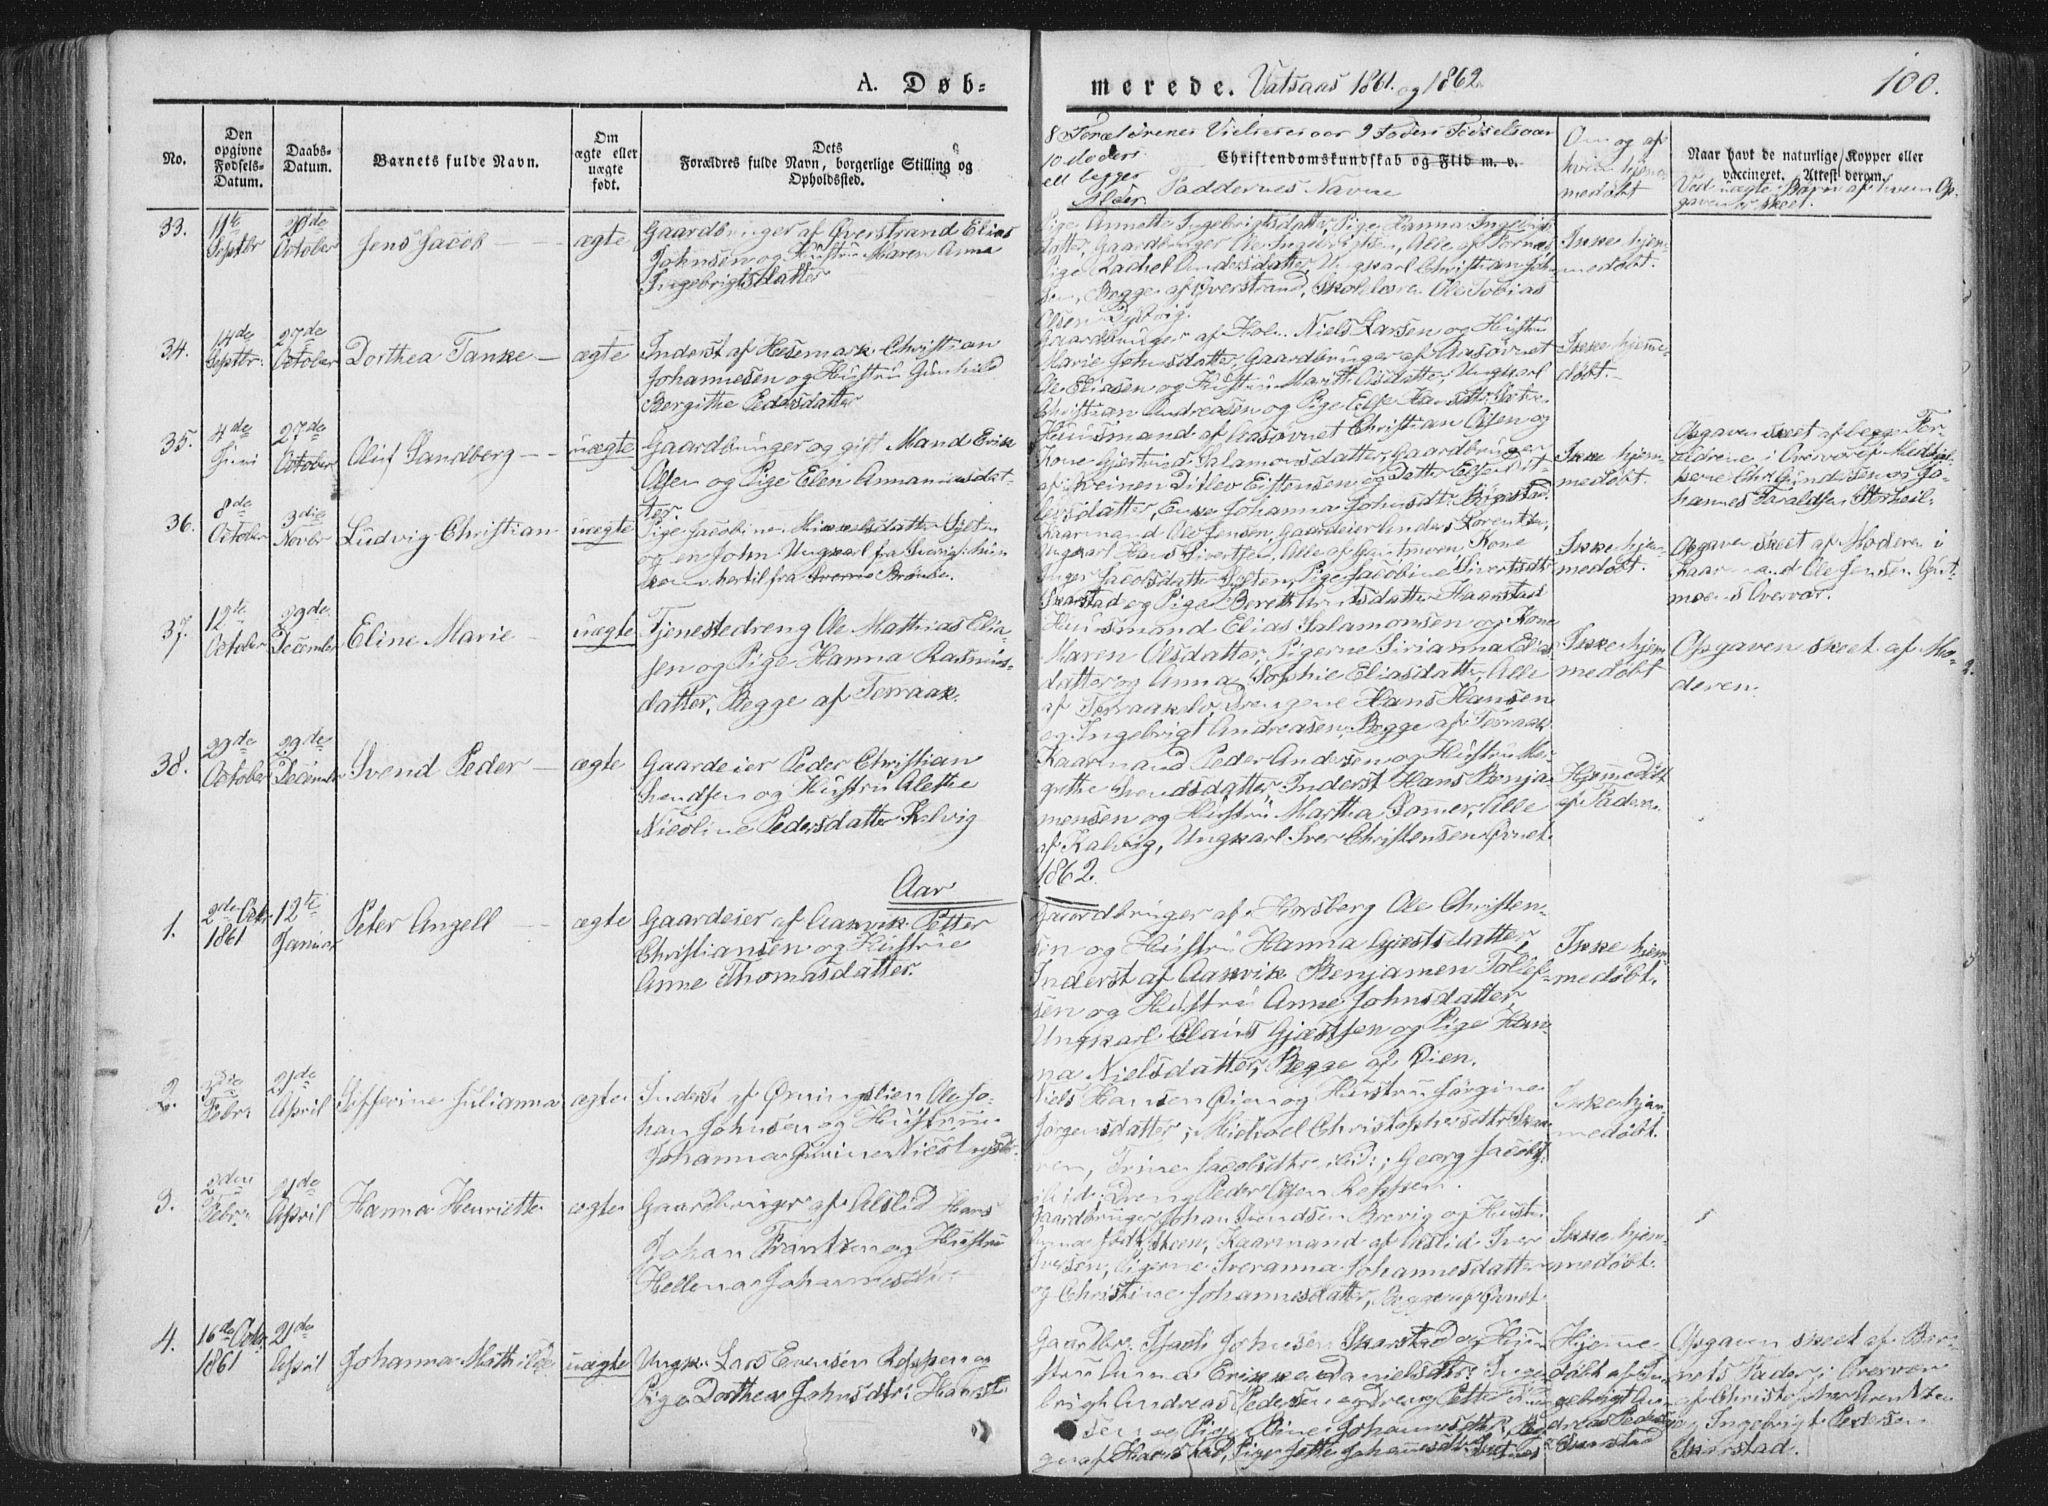 SAT, Ministerialprotokoller, klokkerbøker og fødselsregistre - Nordland, 810/L0144: Ministerialbok nr. 810A07 /1, 1841-1862, s. 100